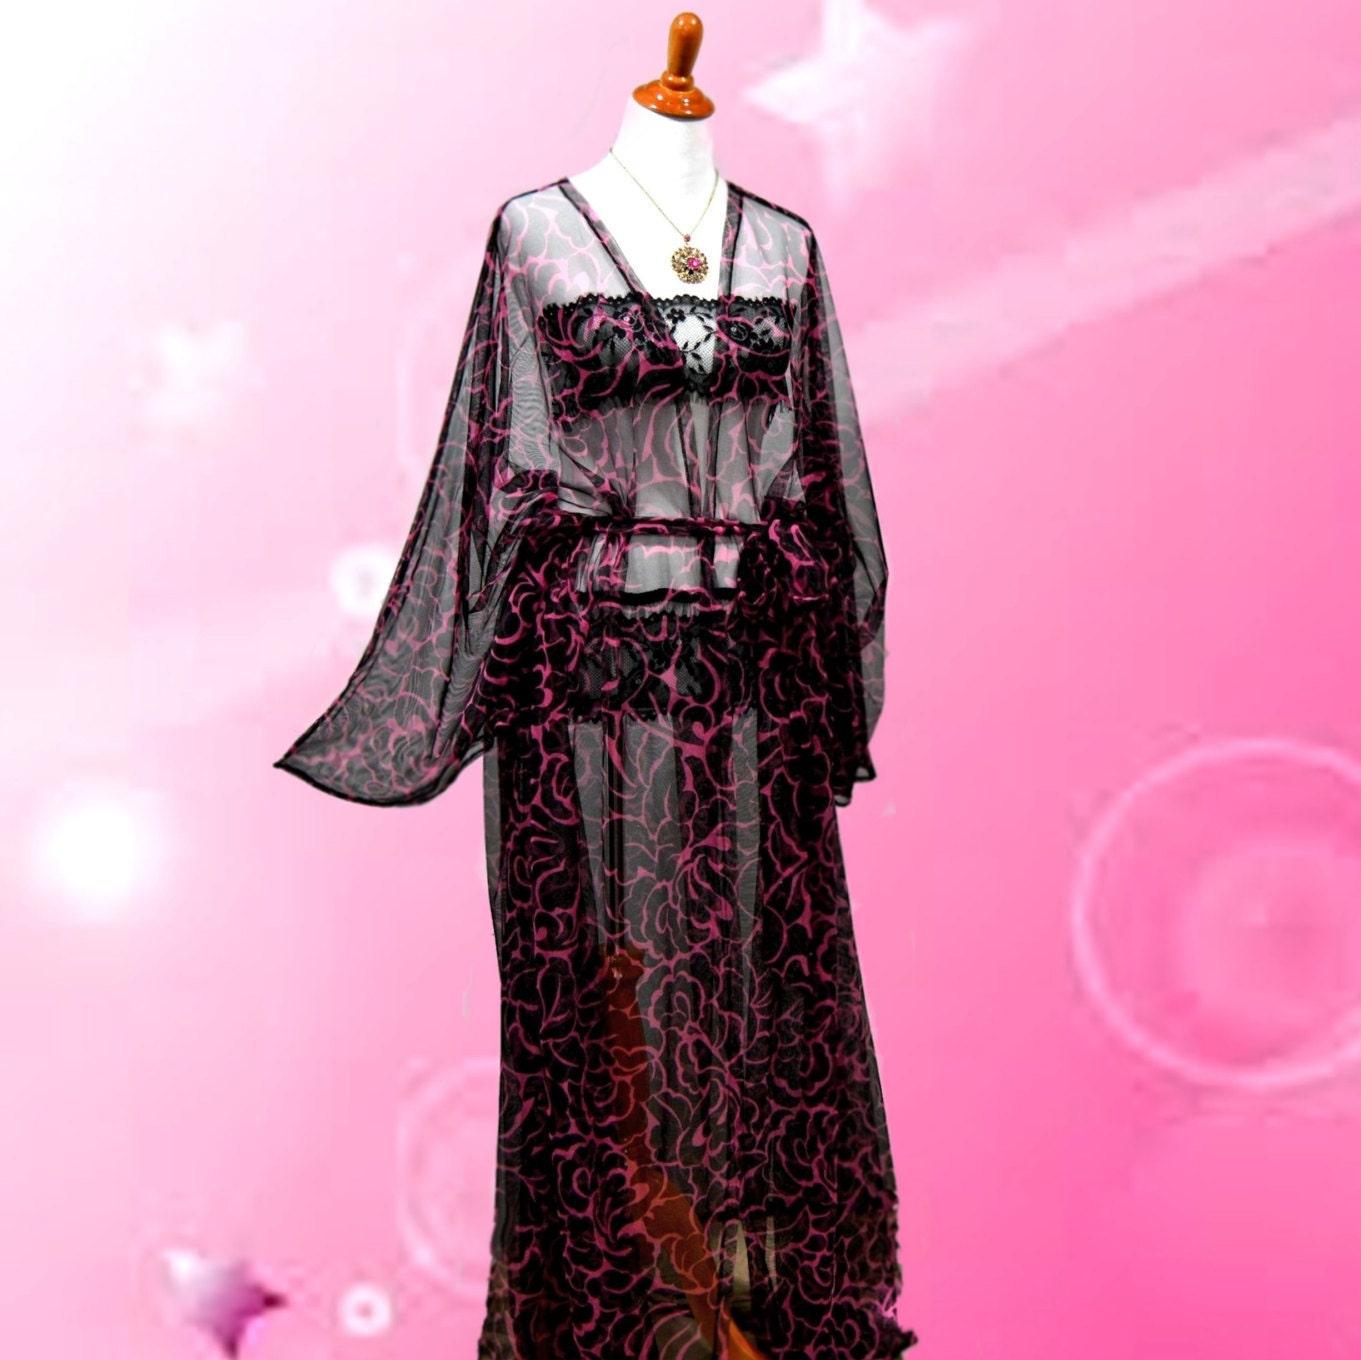 Caliente traje de pura rosa kimono Floral ropa interior | Etsy